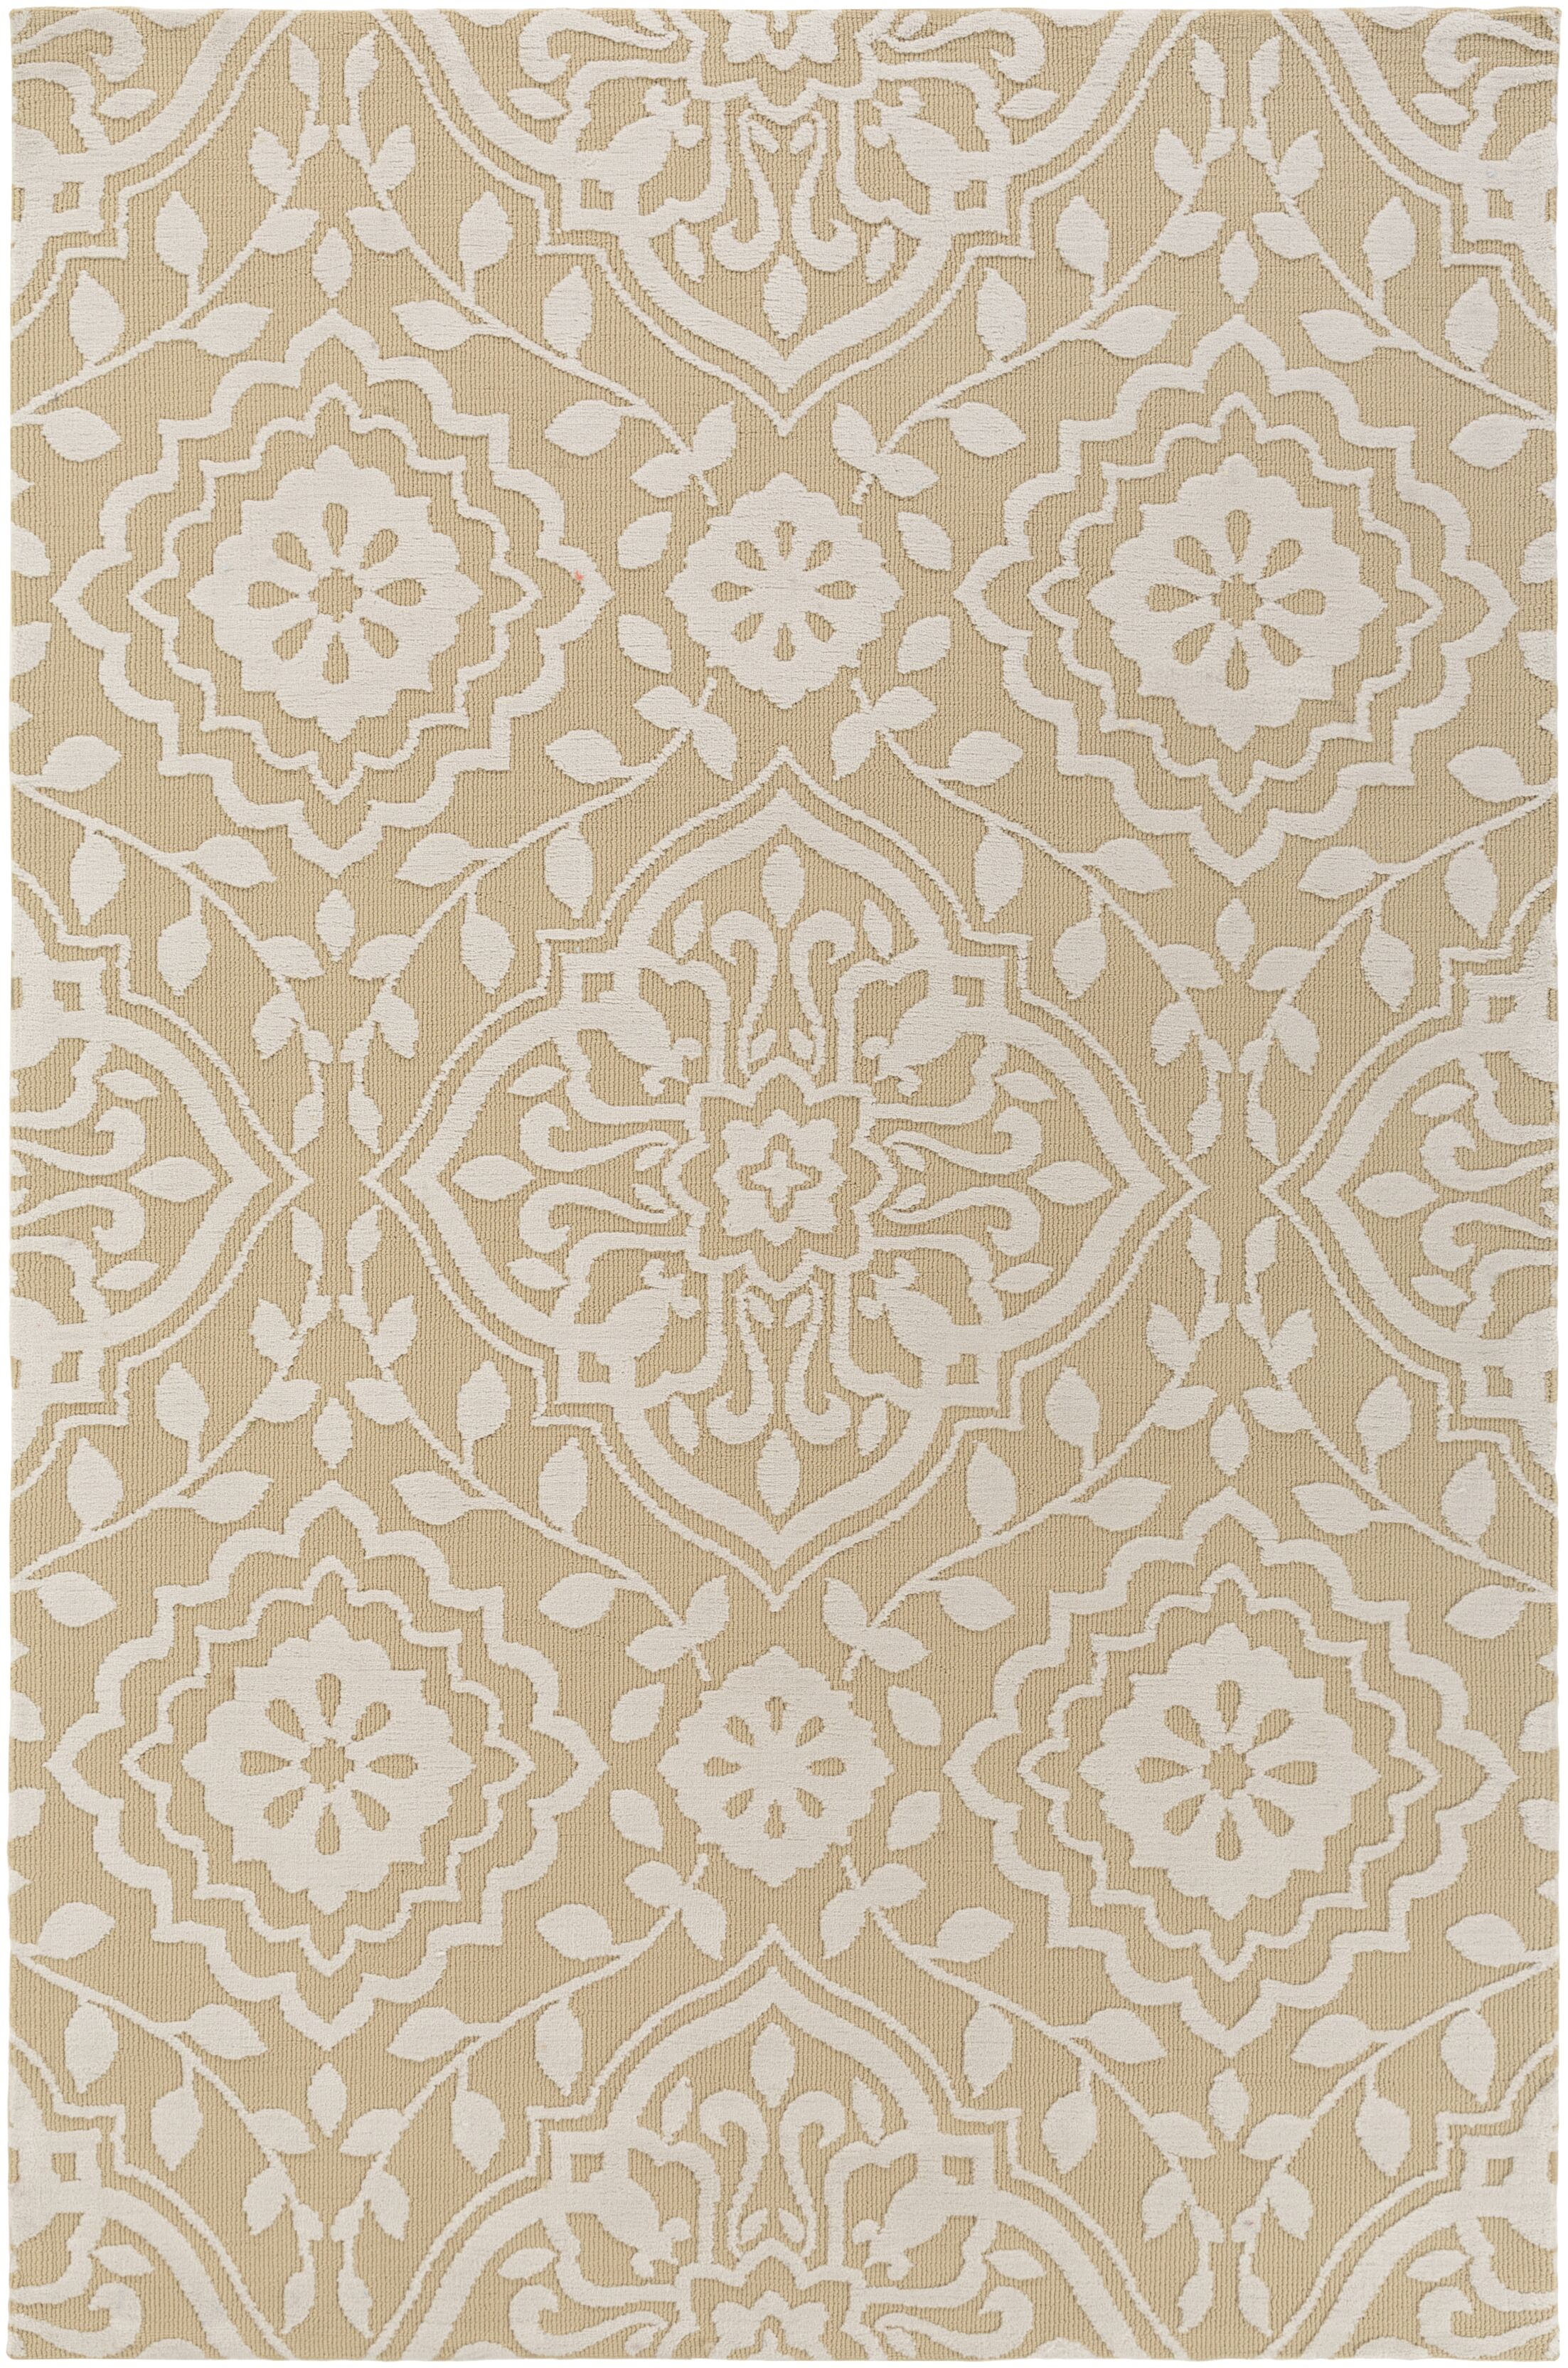 Kesler Straw/Ivory Area Rug Rug Size: Rectangle 7'6